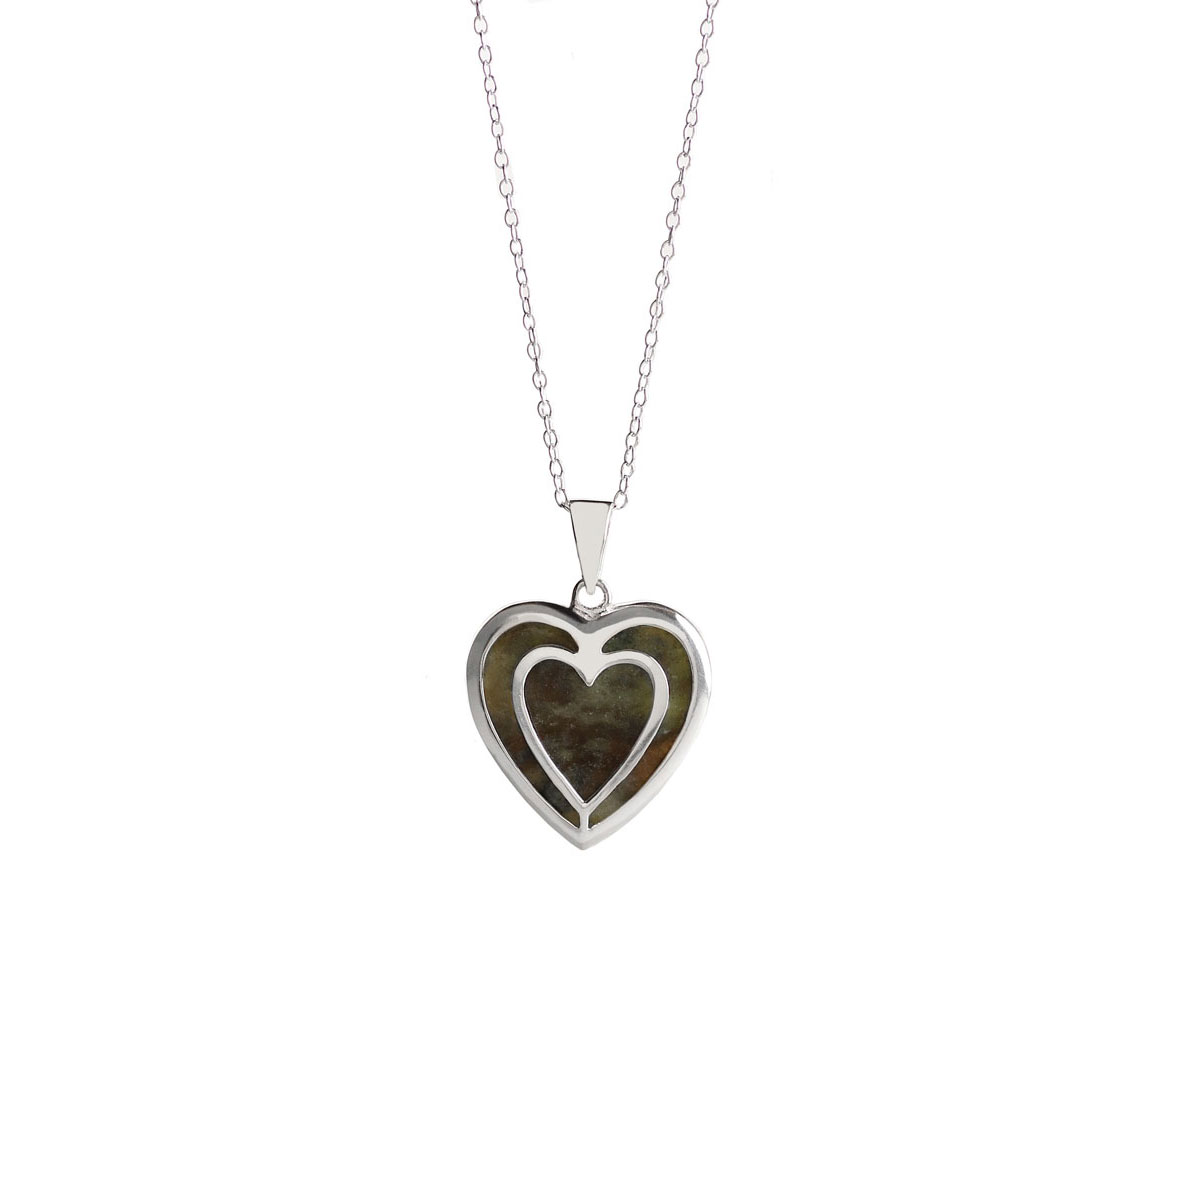 Cashs Ireland, Connemara Marble Heart Necklace